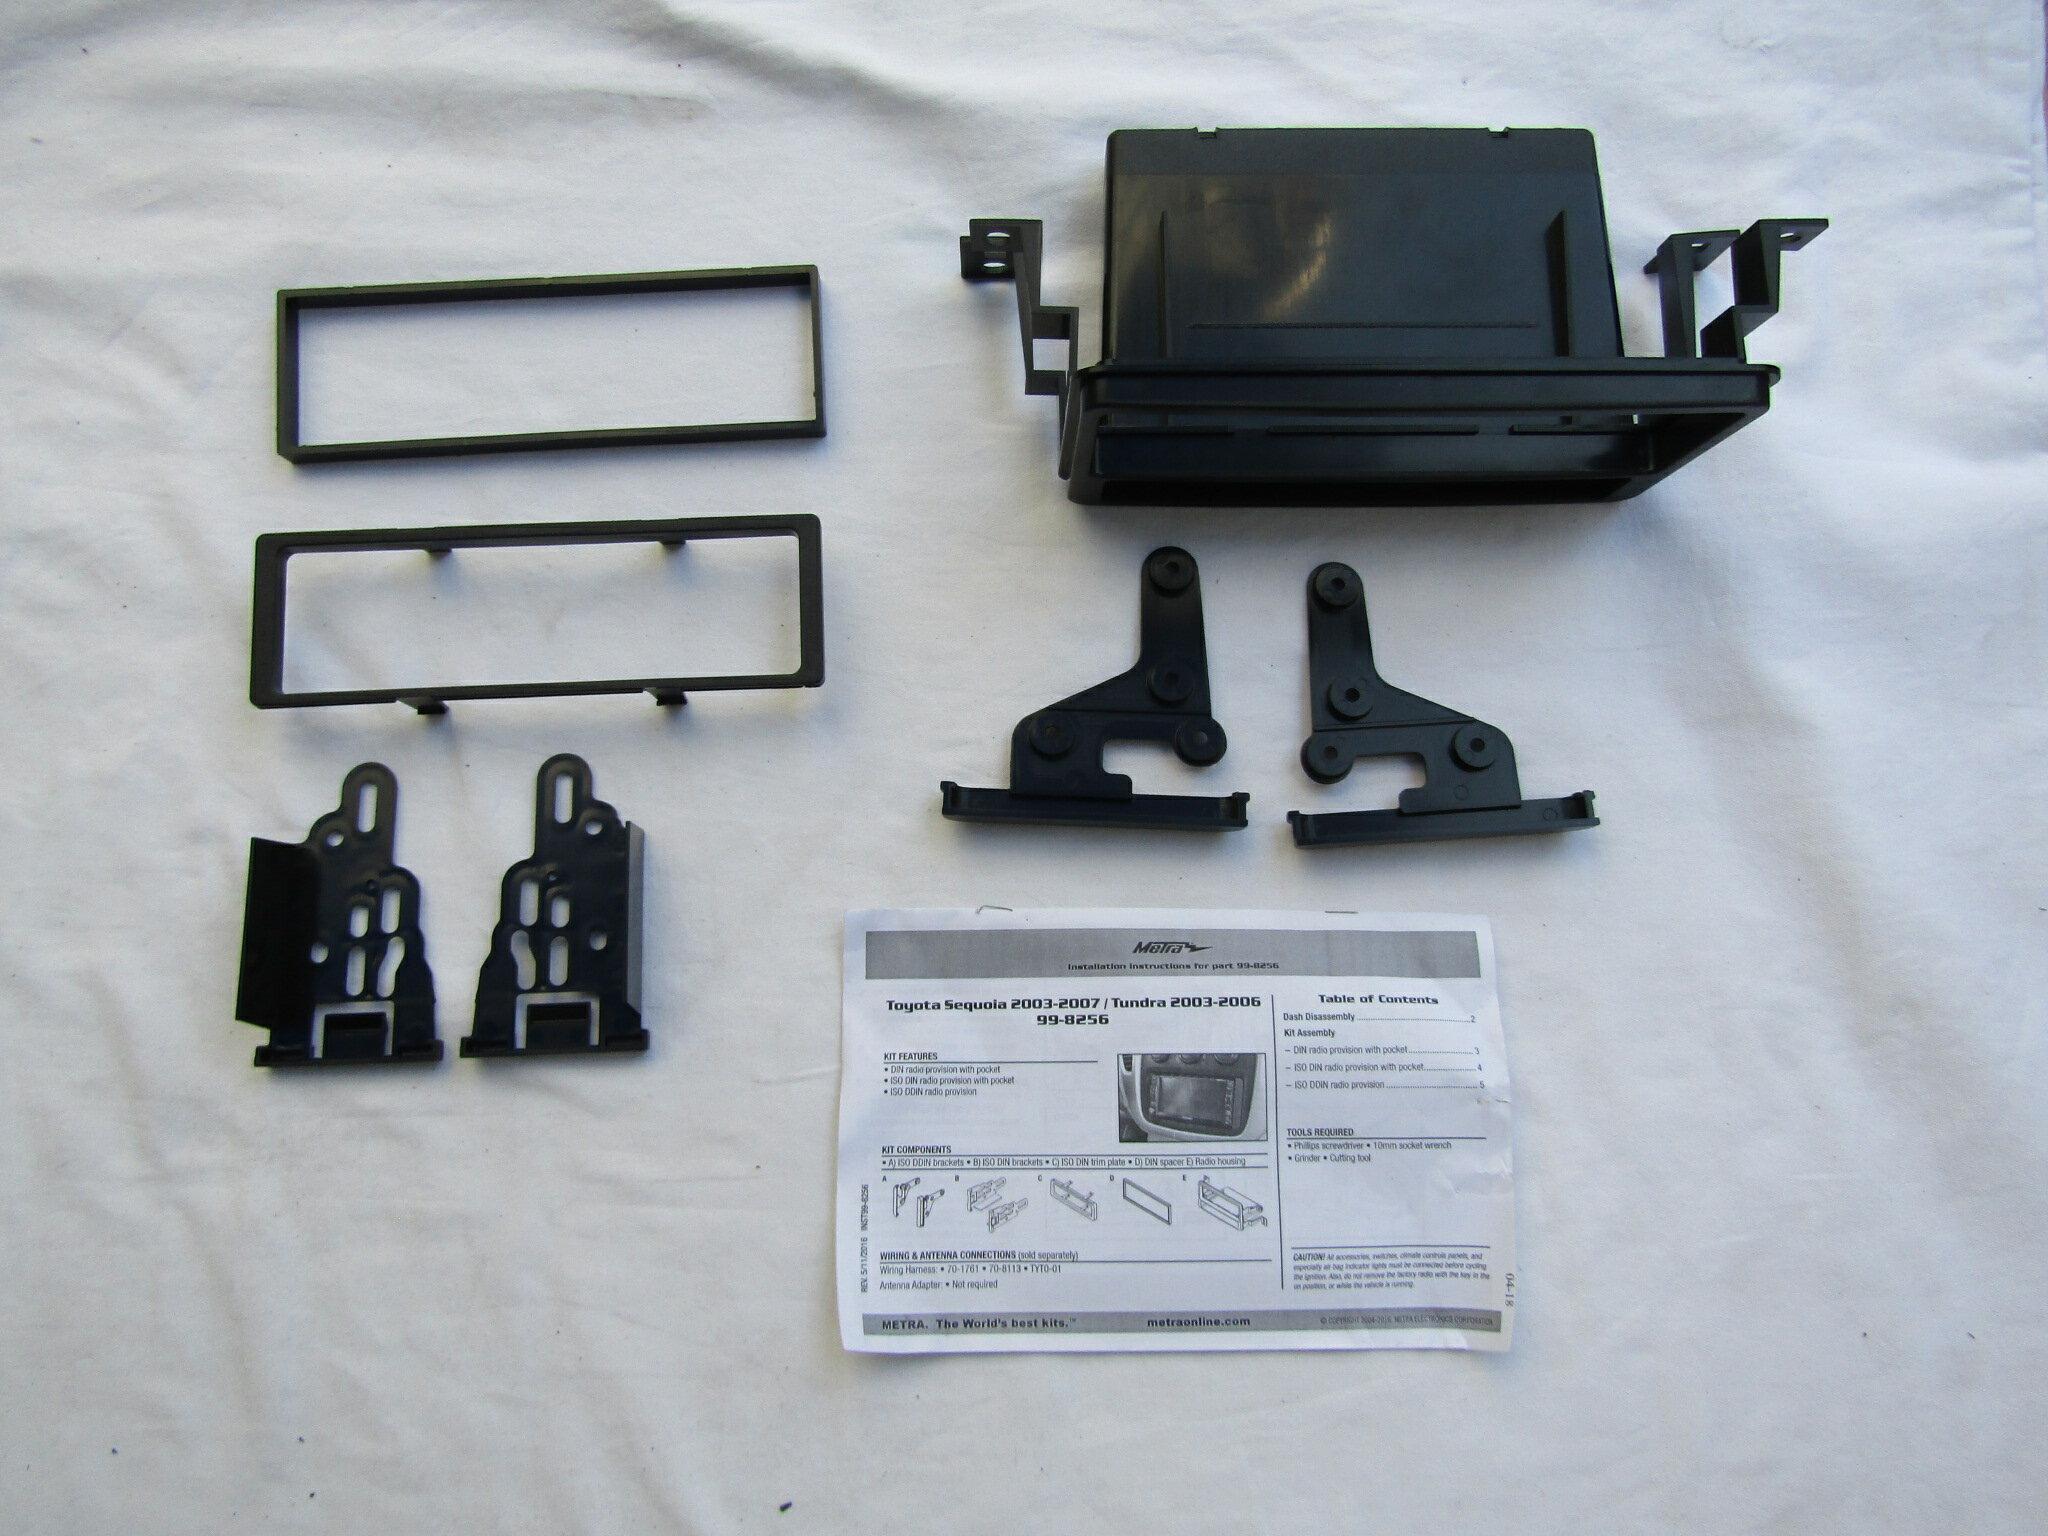 METRA 707901 Radio Wiring Harness Turbowire